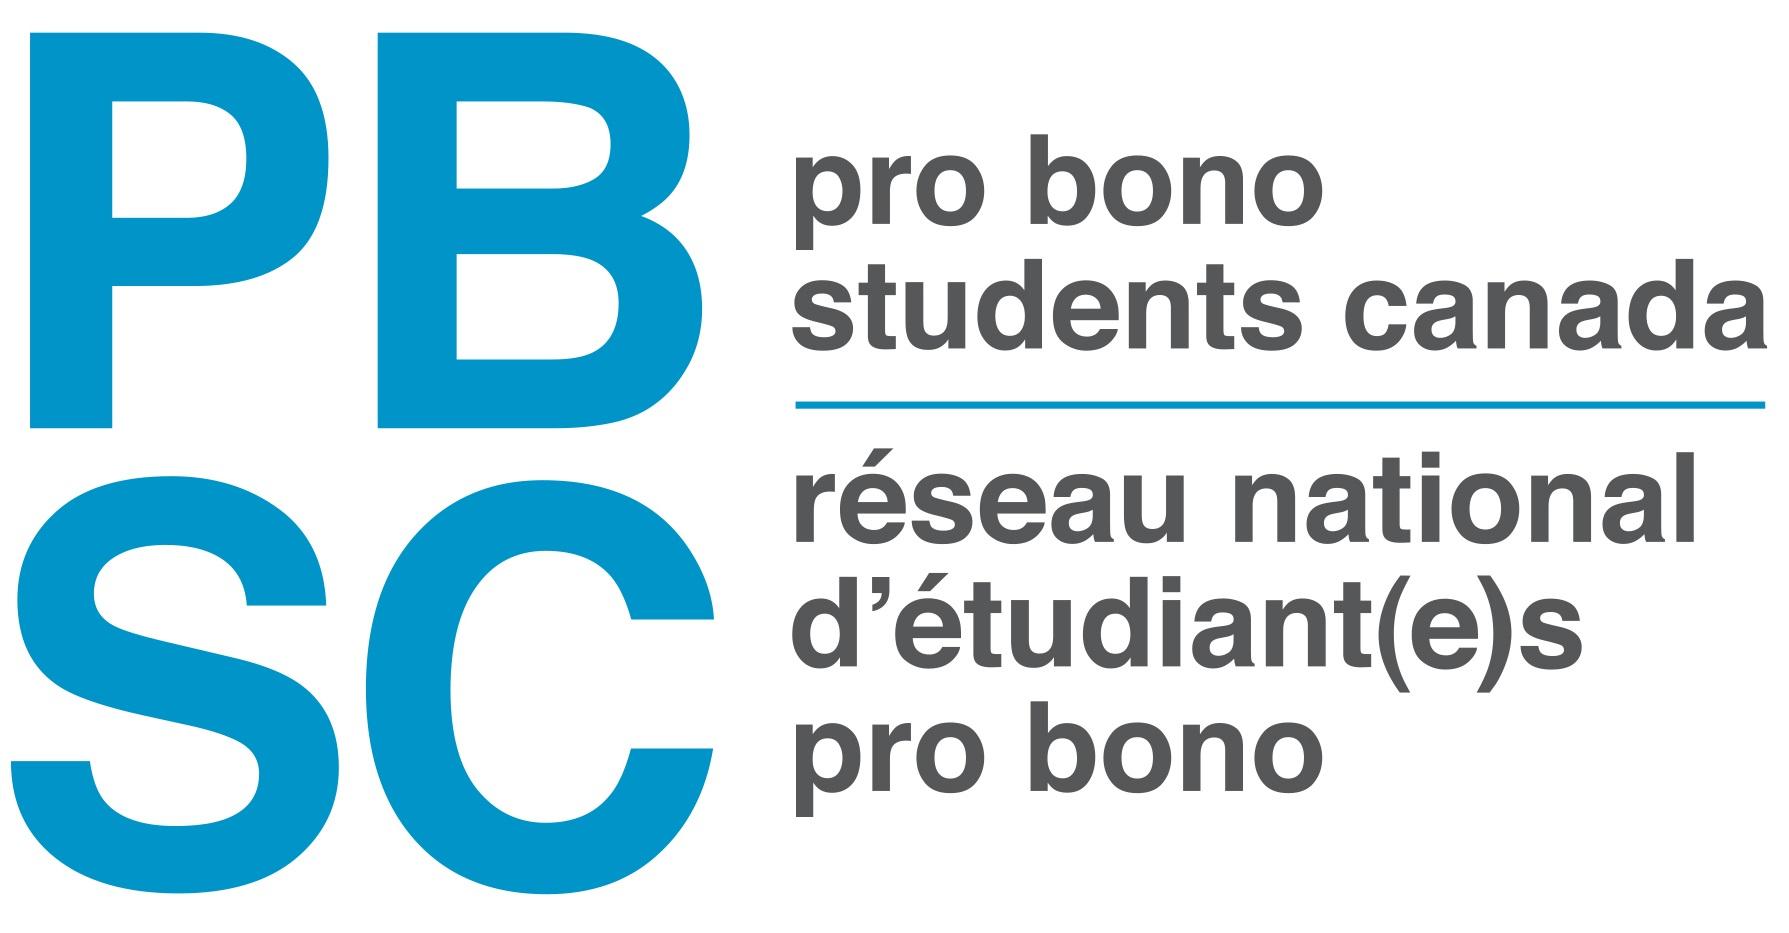 The logo for Pro Bono Students Canada